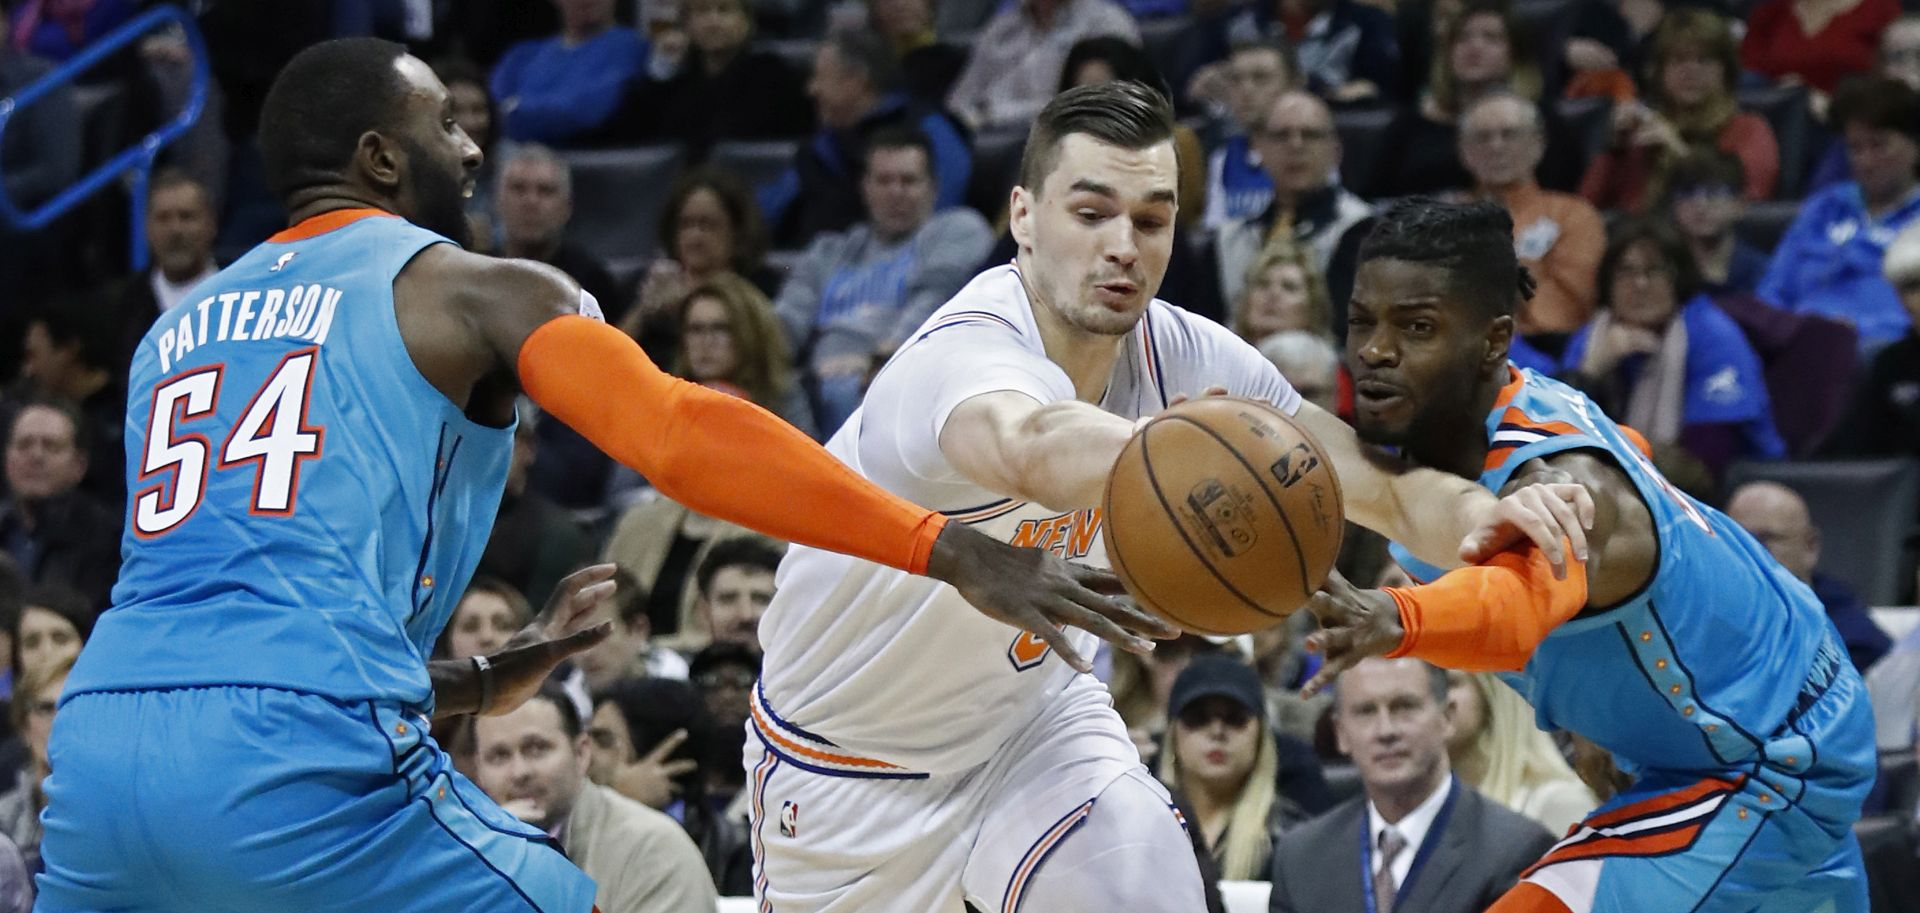 NBA: Double-double Hezonje u porazu Portlanda, devet koševa Šarića u pobjedi Phoenixa